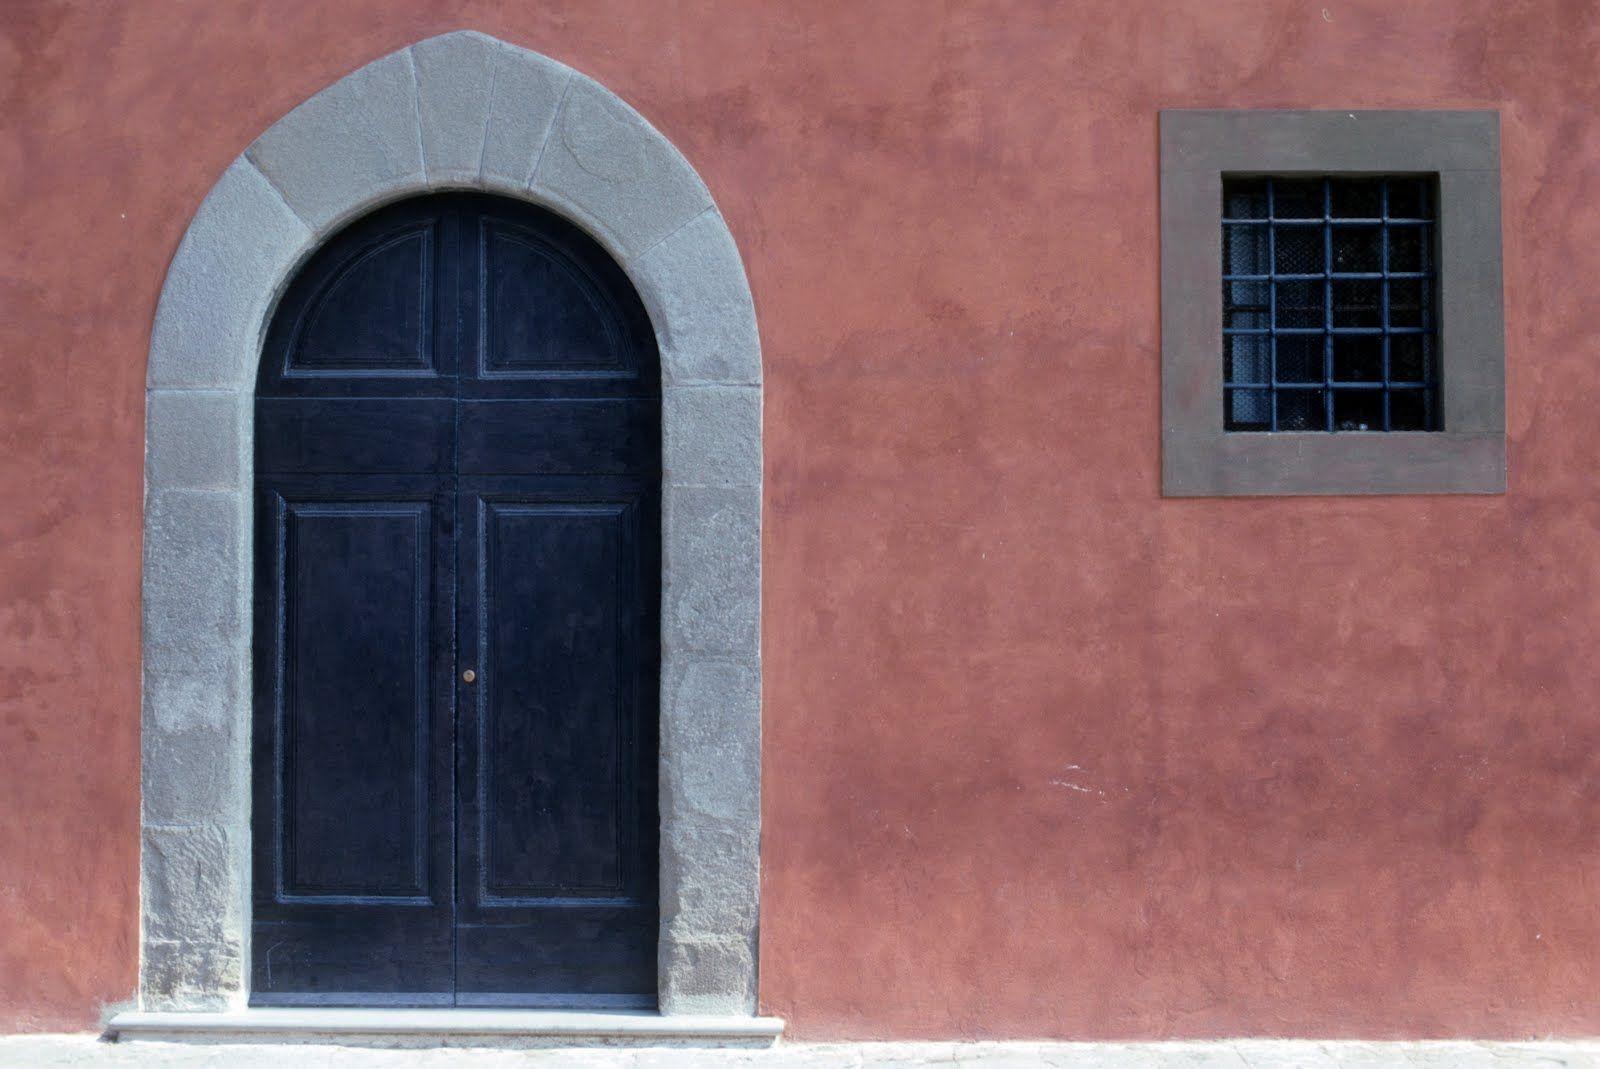 Simplicity Asymmetrical Balance Photography